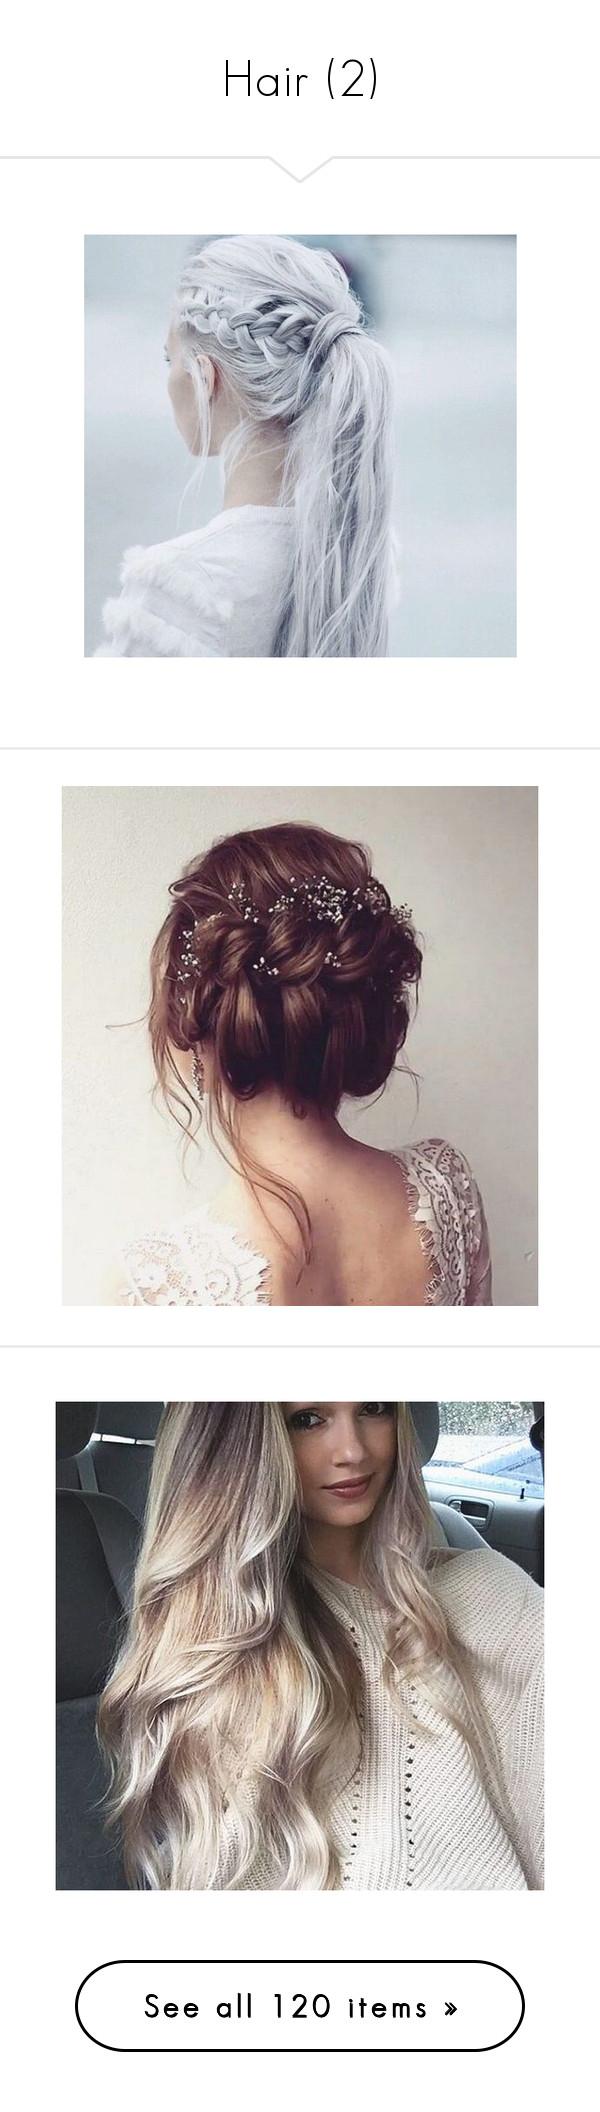 Hair (2)\